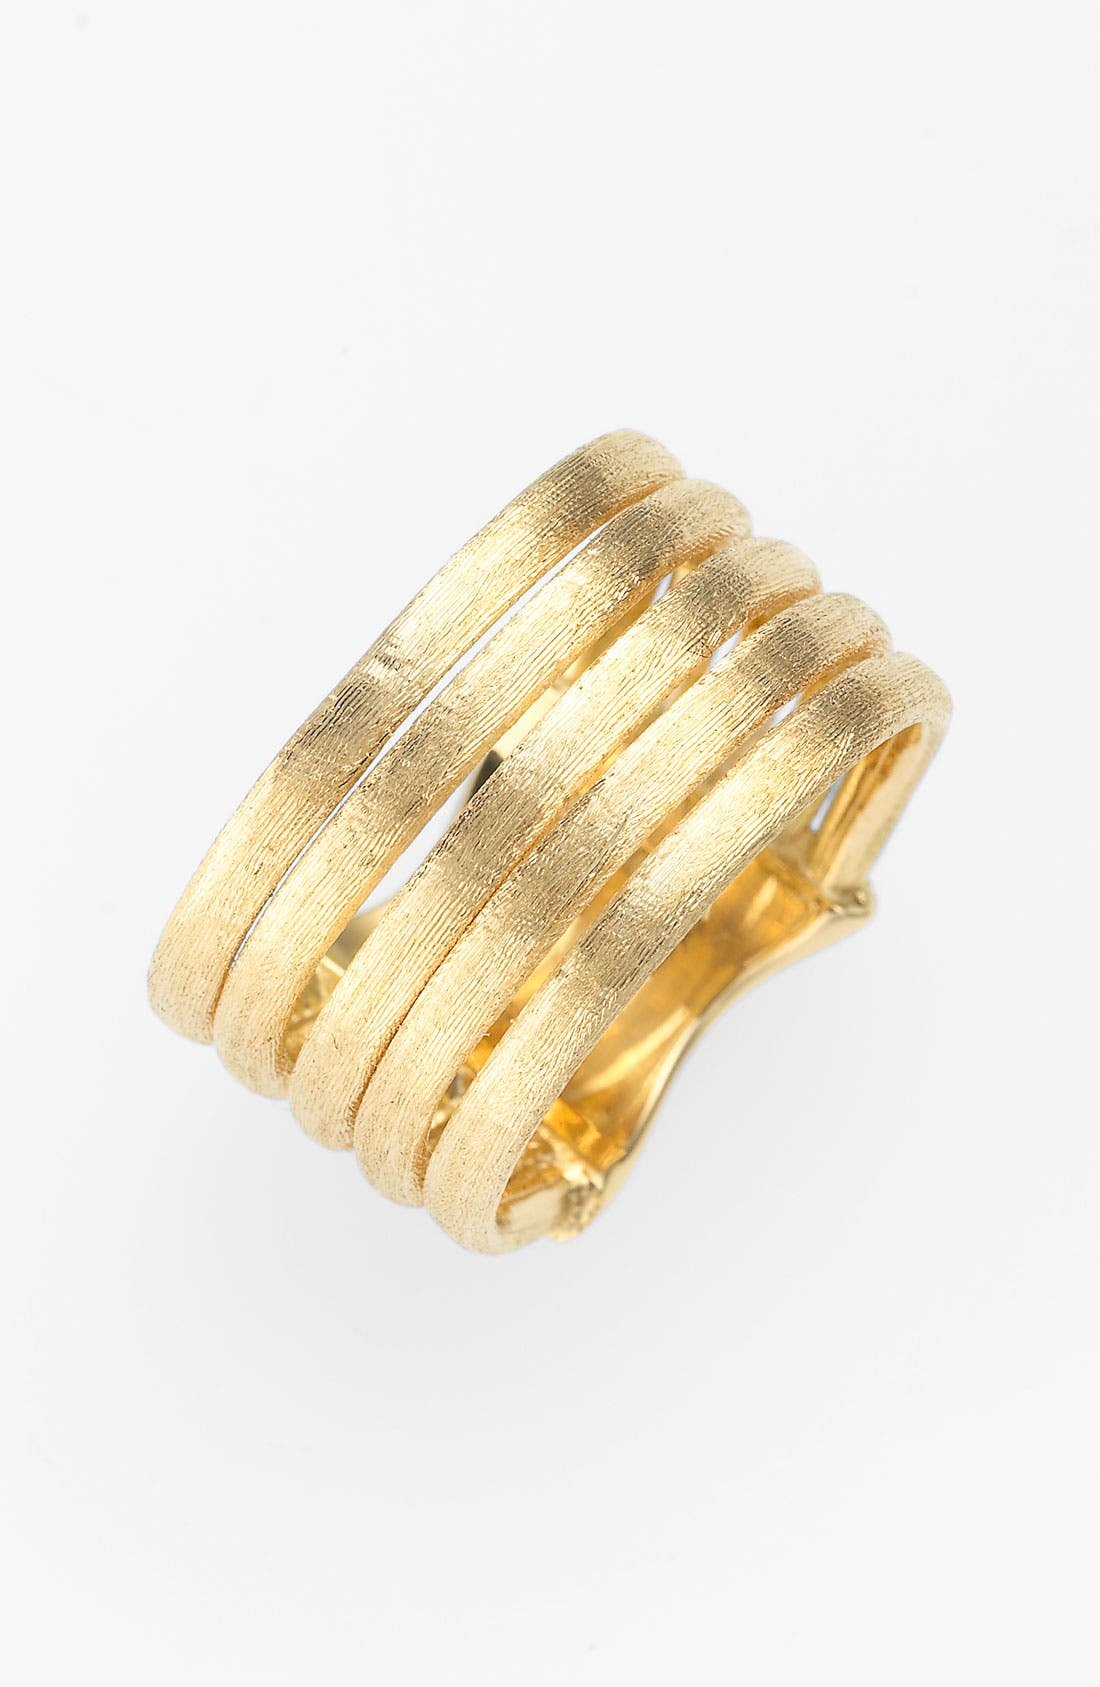 Alternate Image 1 Selected - Marco Bicego 'Jaipur' Gold Ring